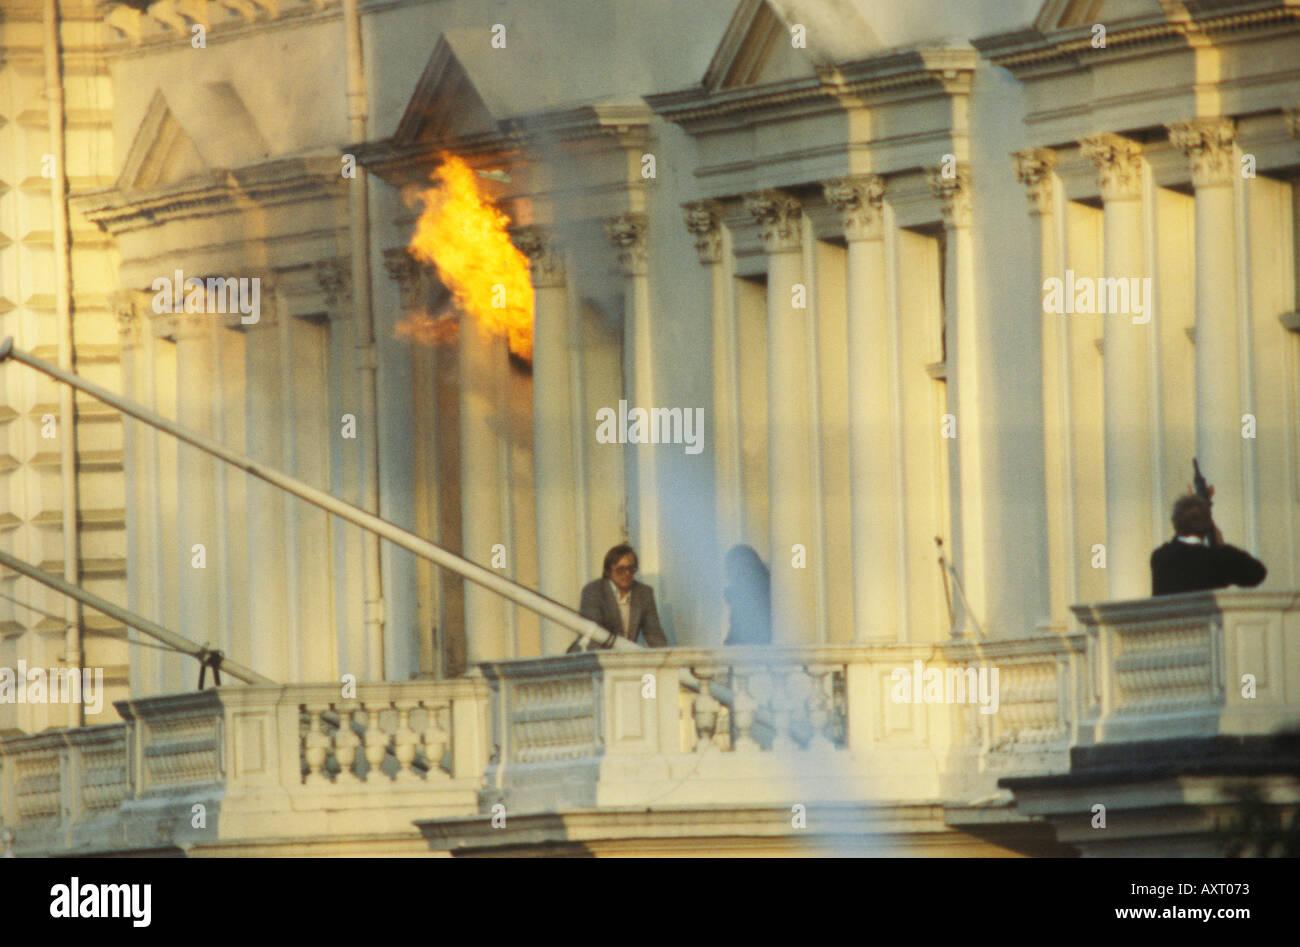 Ambasciata Iraniana assedio il 5 maggio 1980 Londra UK HOMER SYKES Immagini Stock